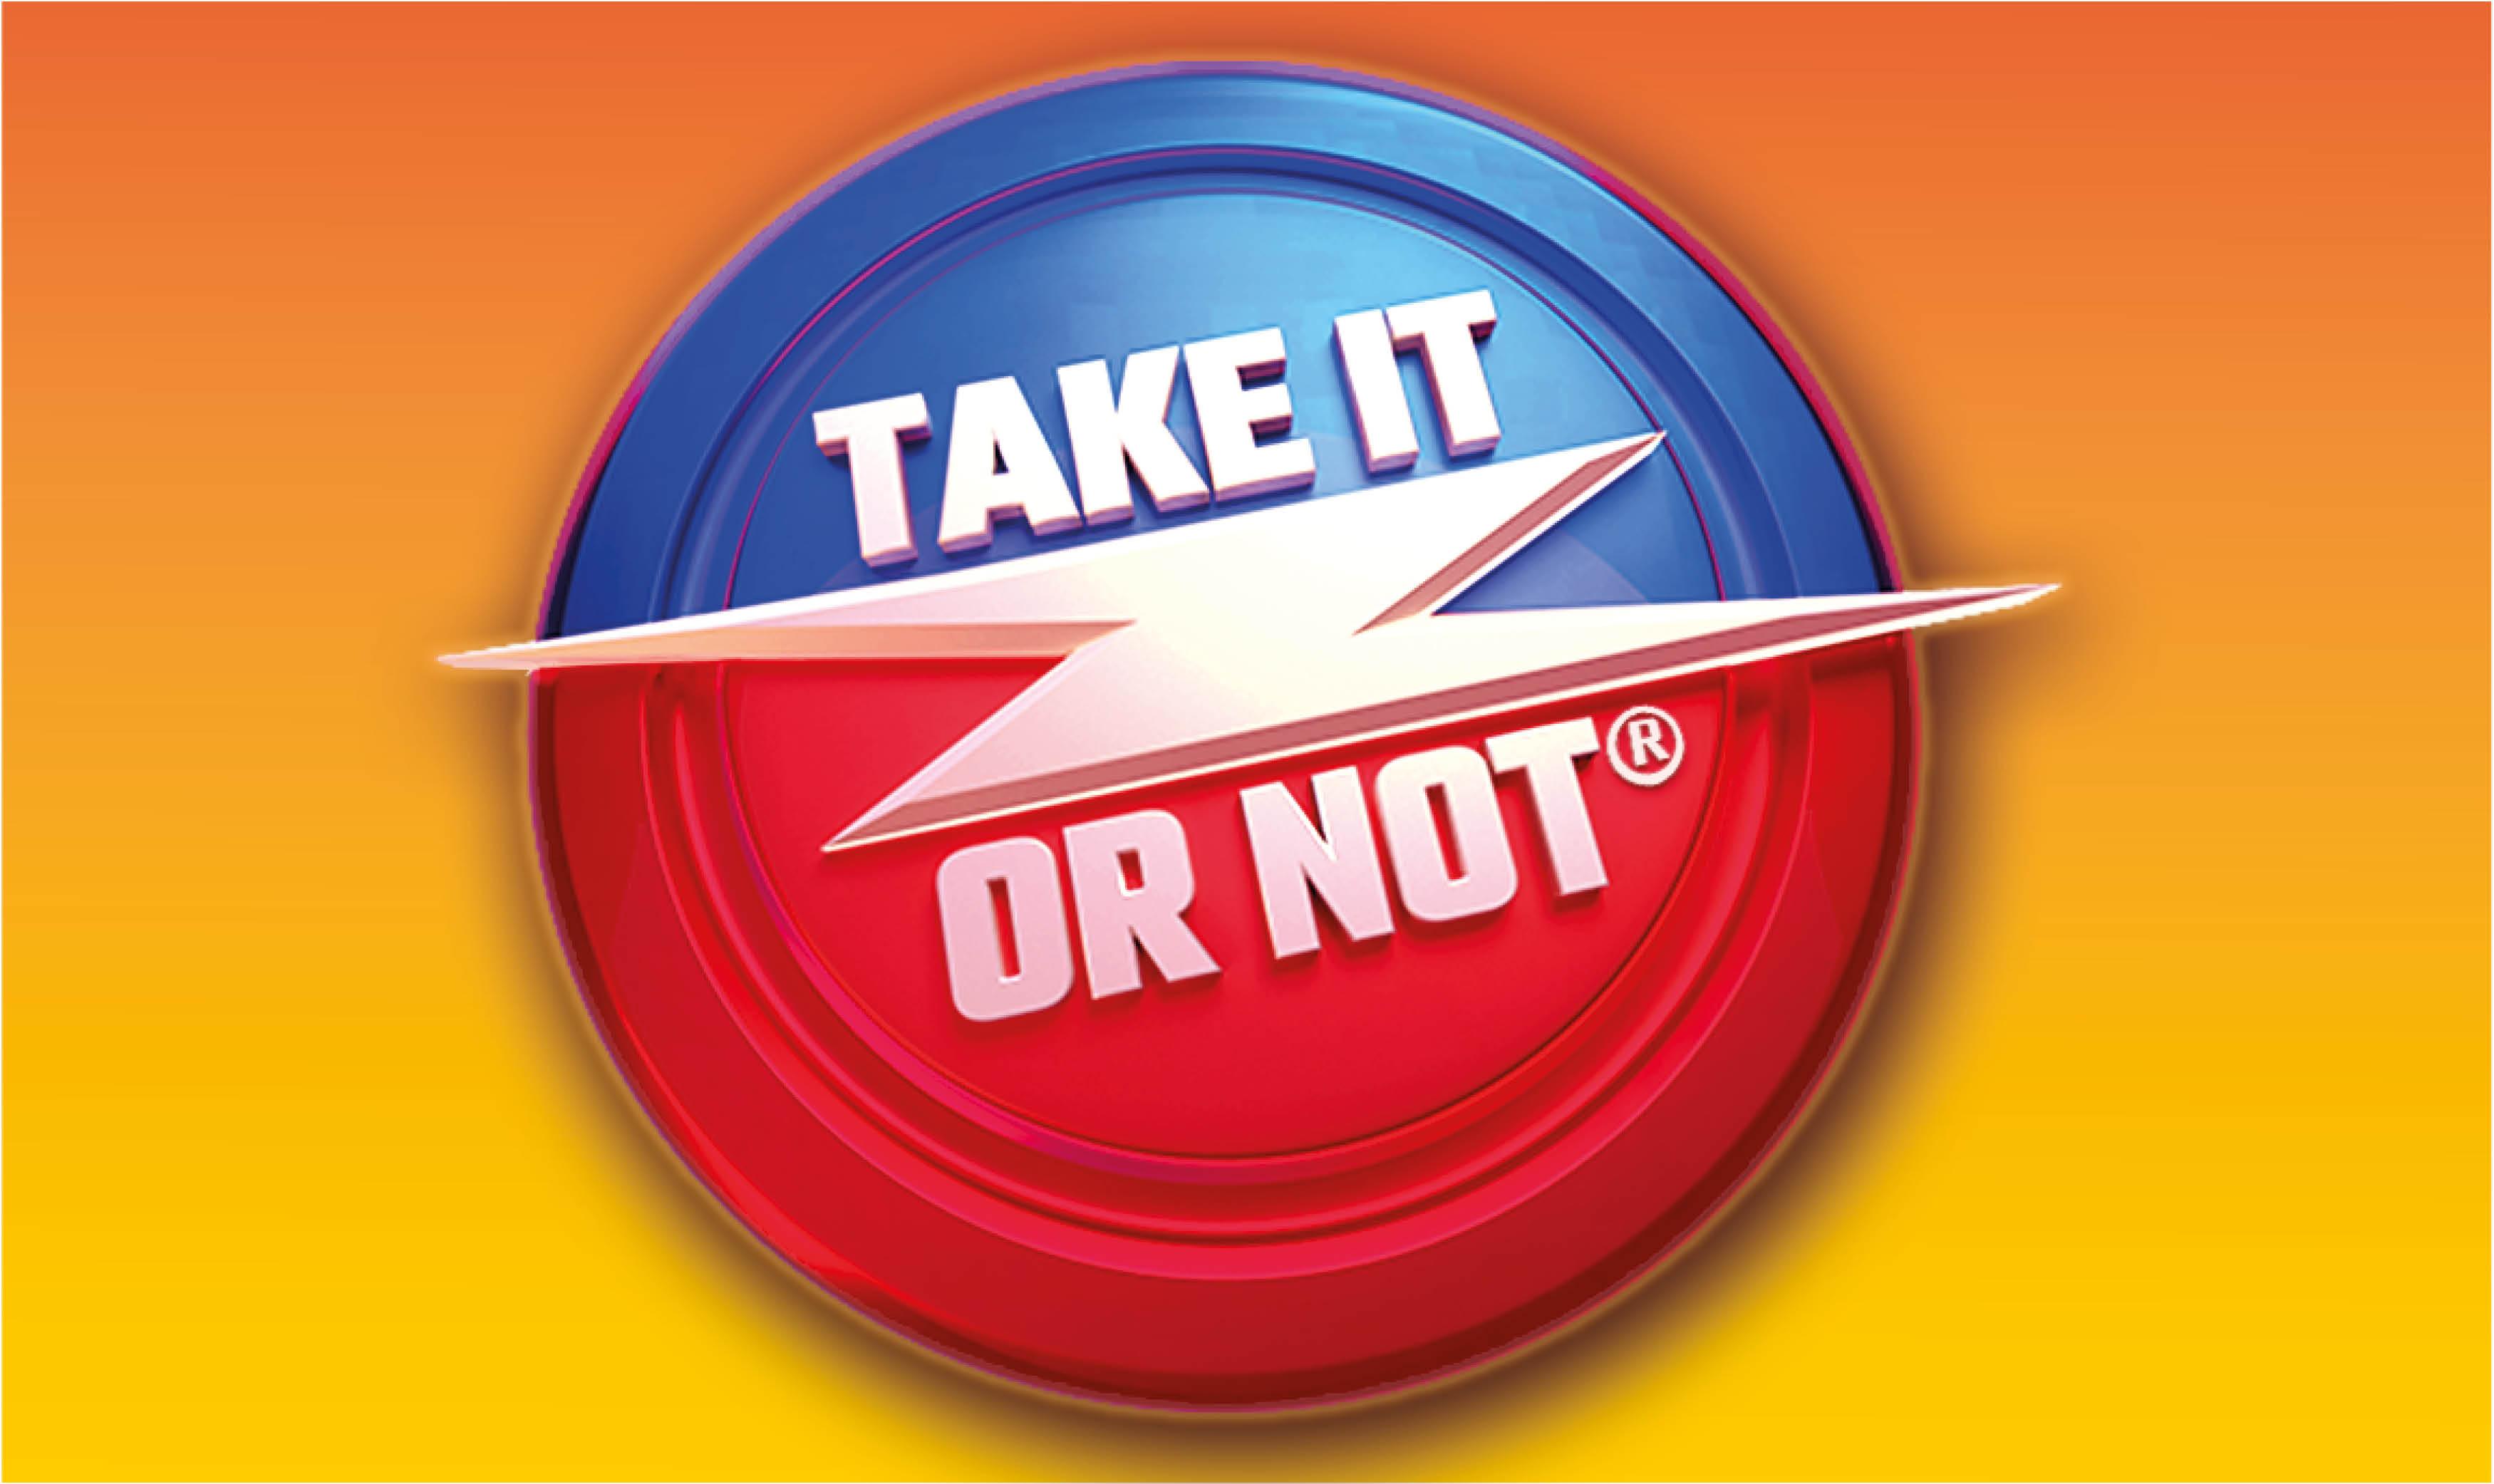 Take it or not